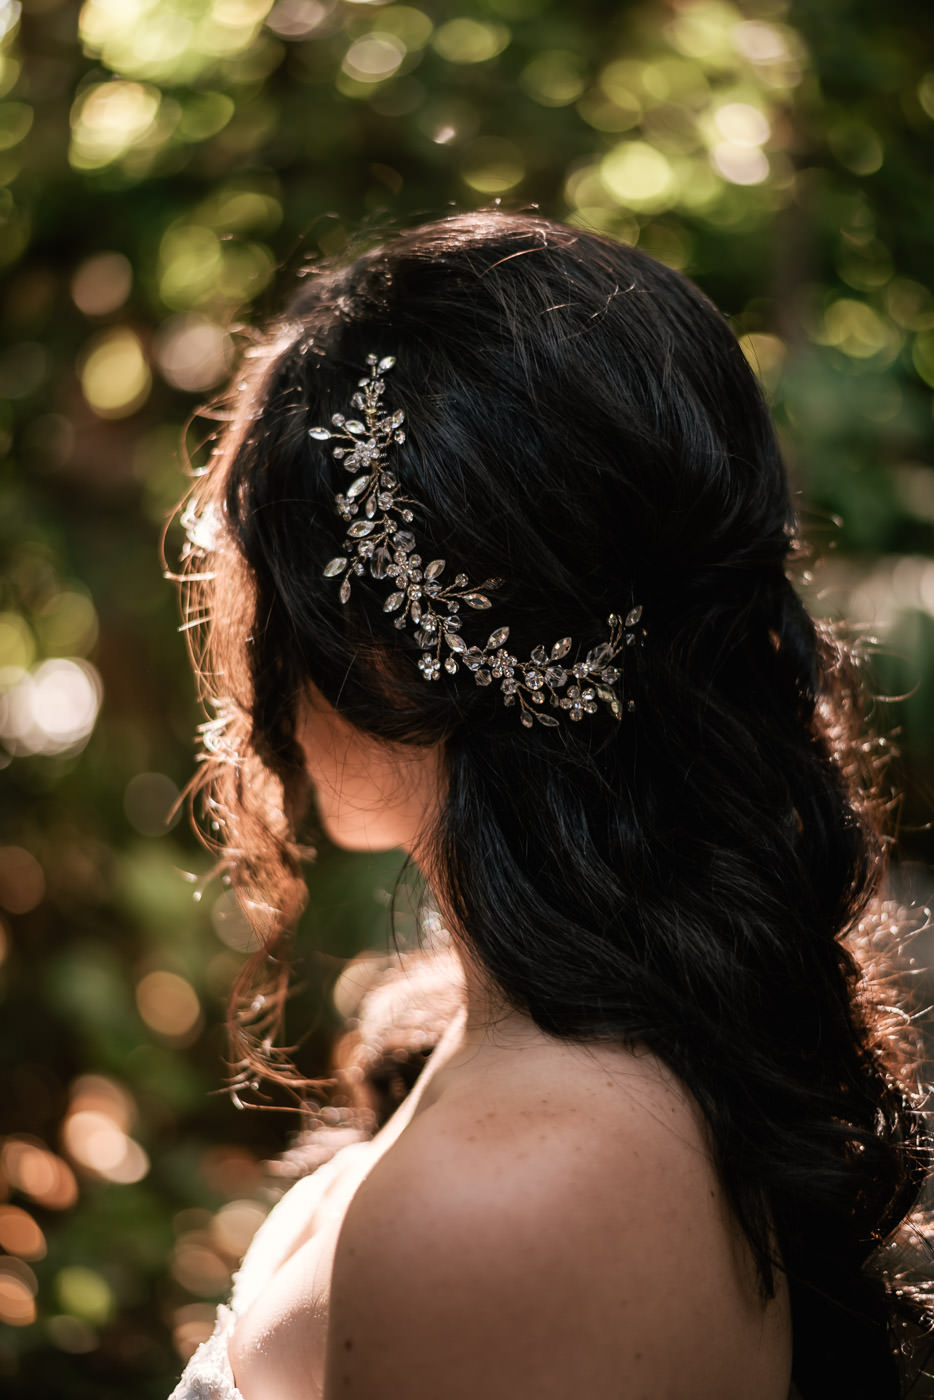 eden-gardens-wedding-photographer-romantic-8.jpg